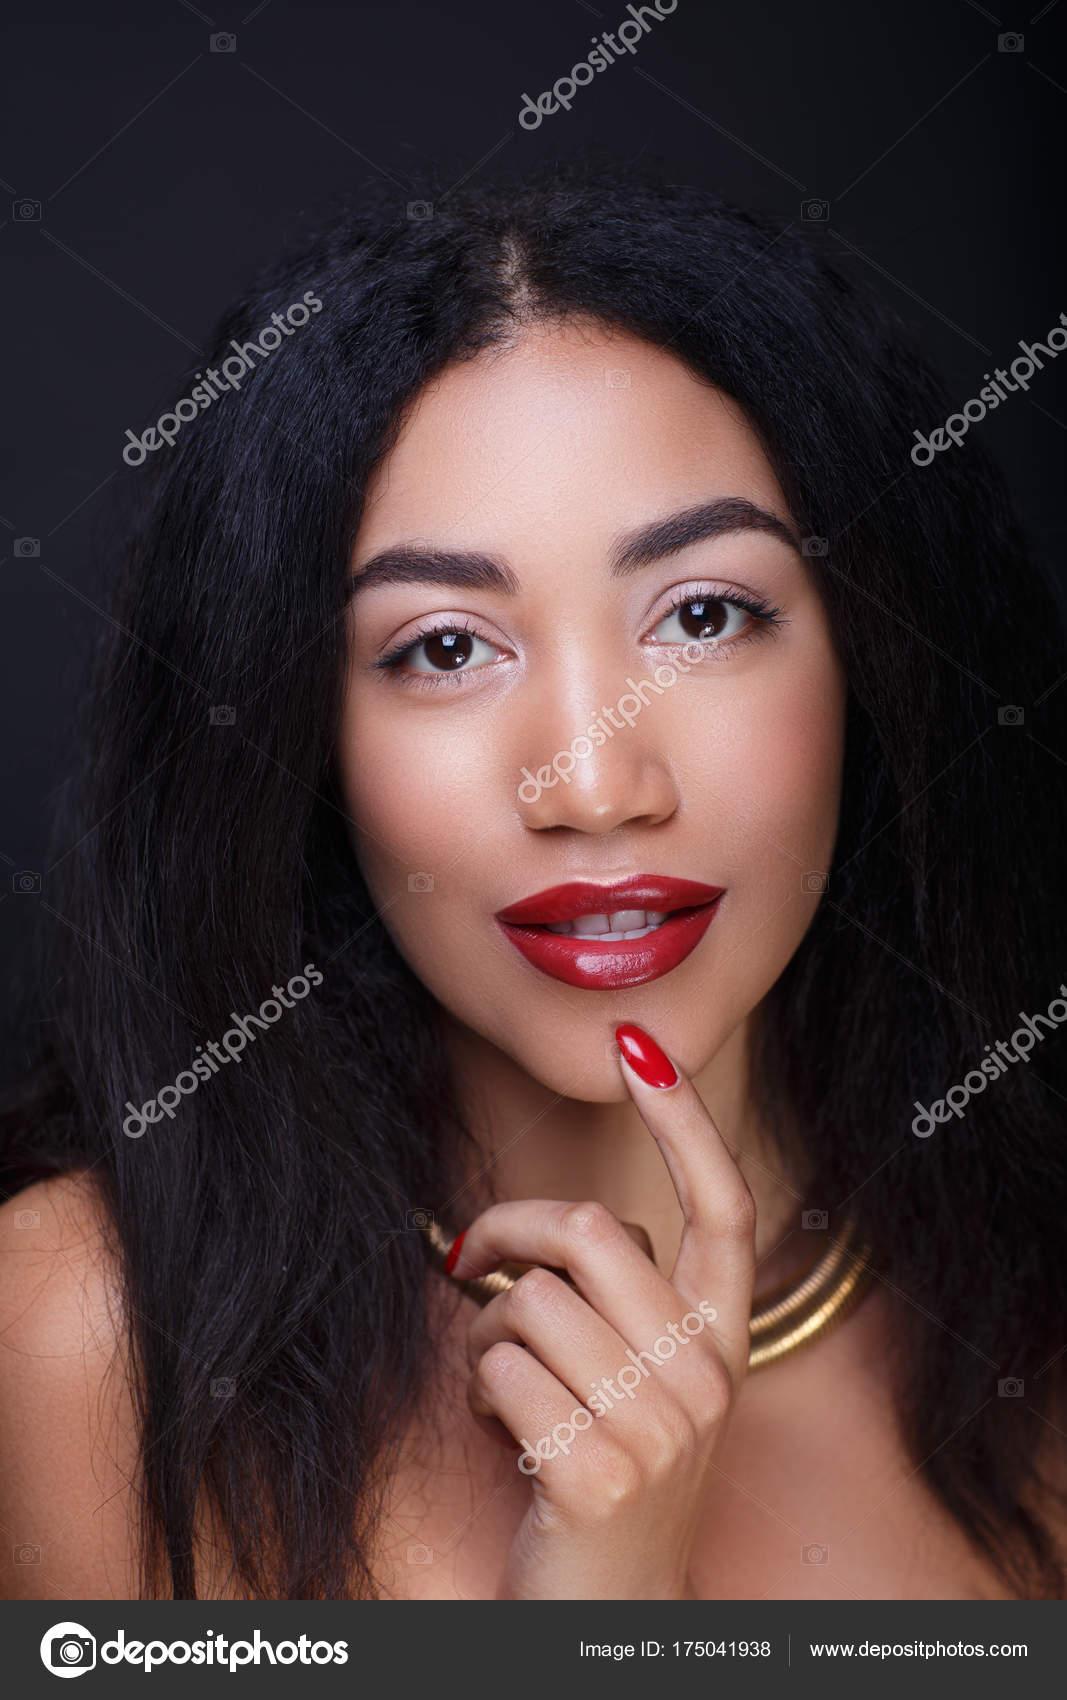 Lèvres Rouge Femme Rouge Femme Femme Rouge Lèvres Lèvres E2WHe9IDY